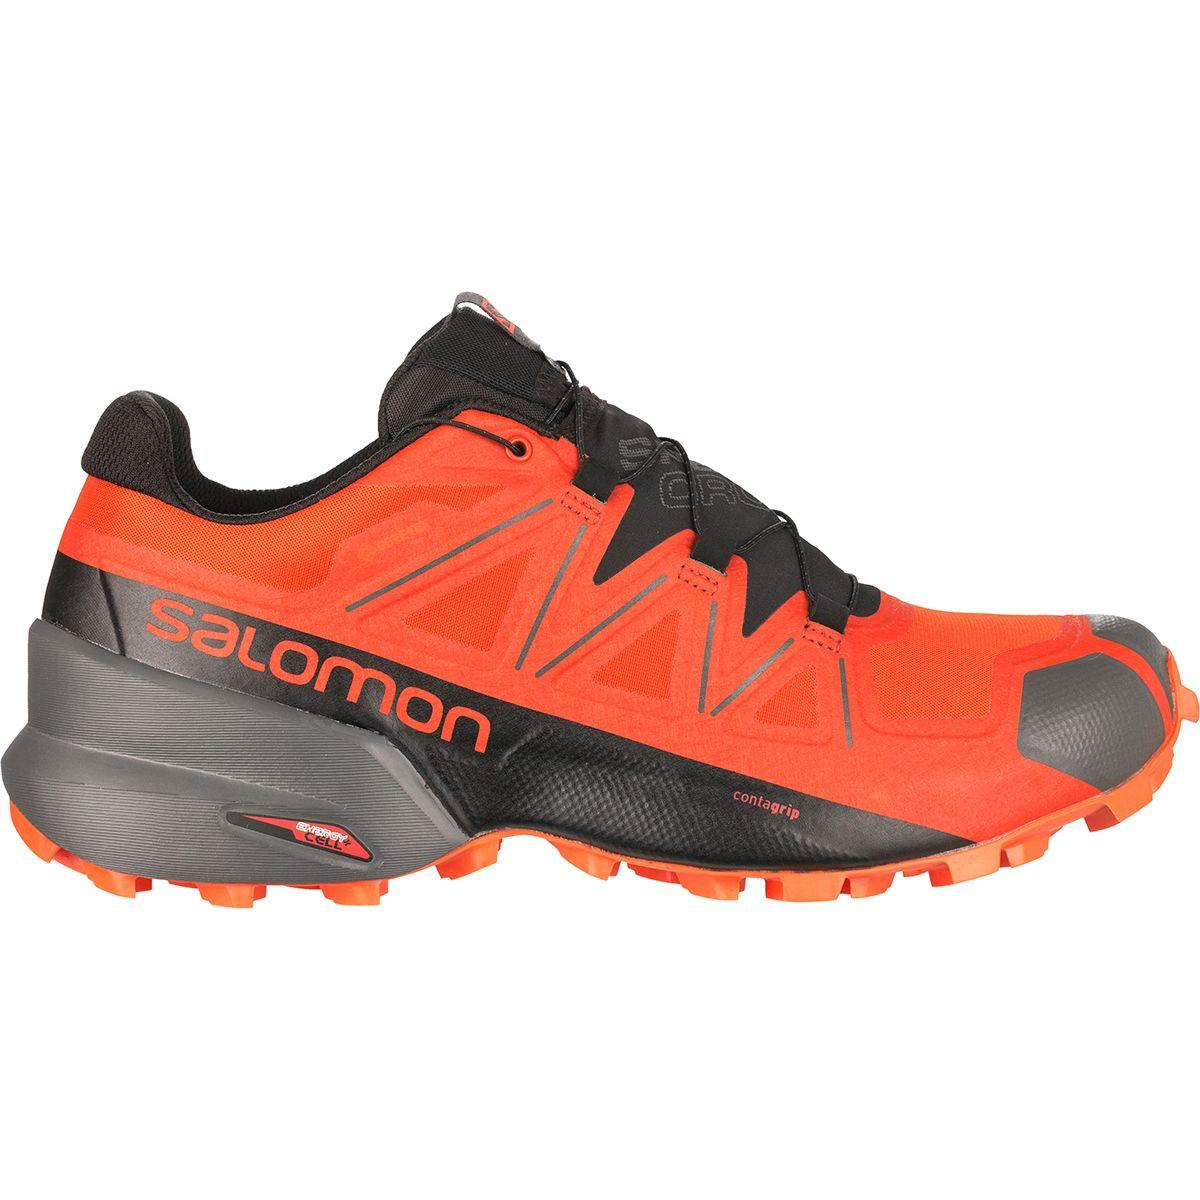 Salomon Salomon Women's Speedcross 5 GTX Trail Running Shoes, BlackBlackPHANTOM, 10.5 from Amazon | People